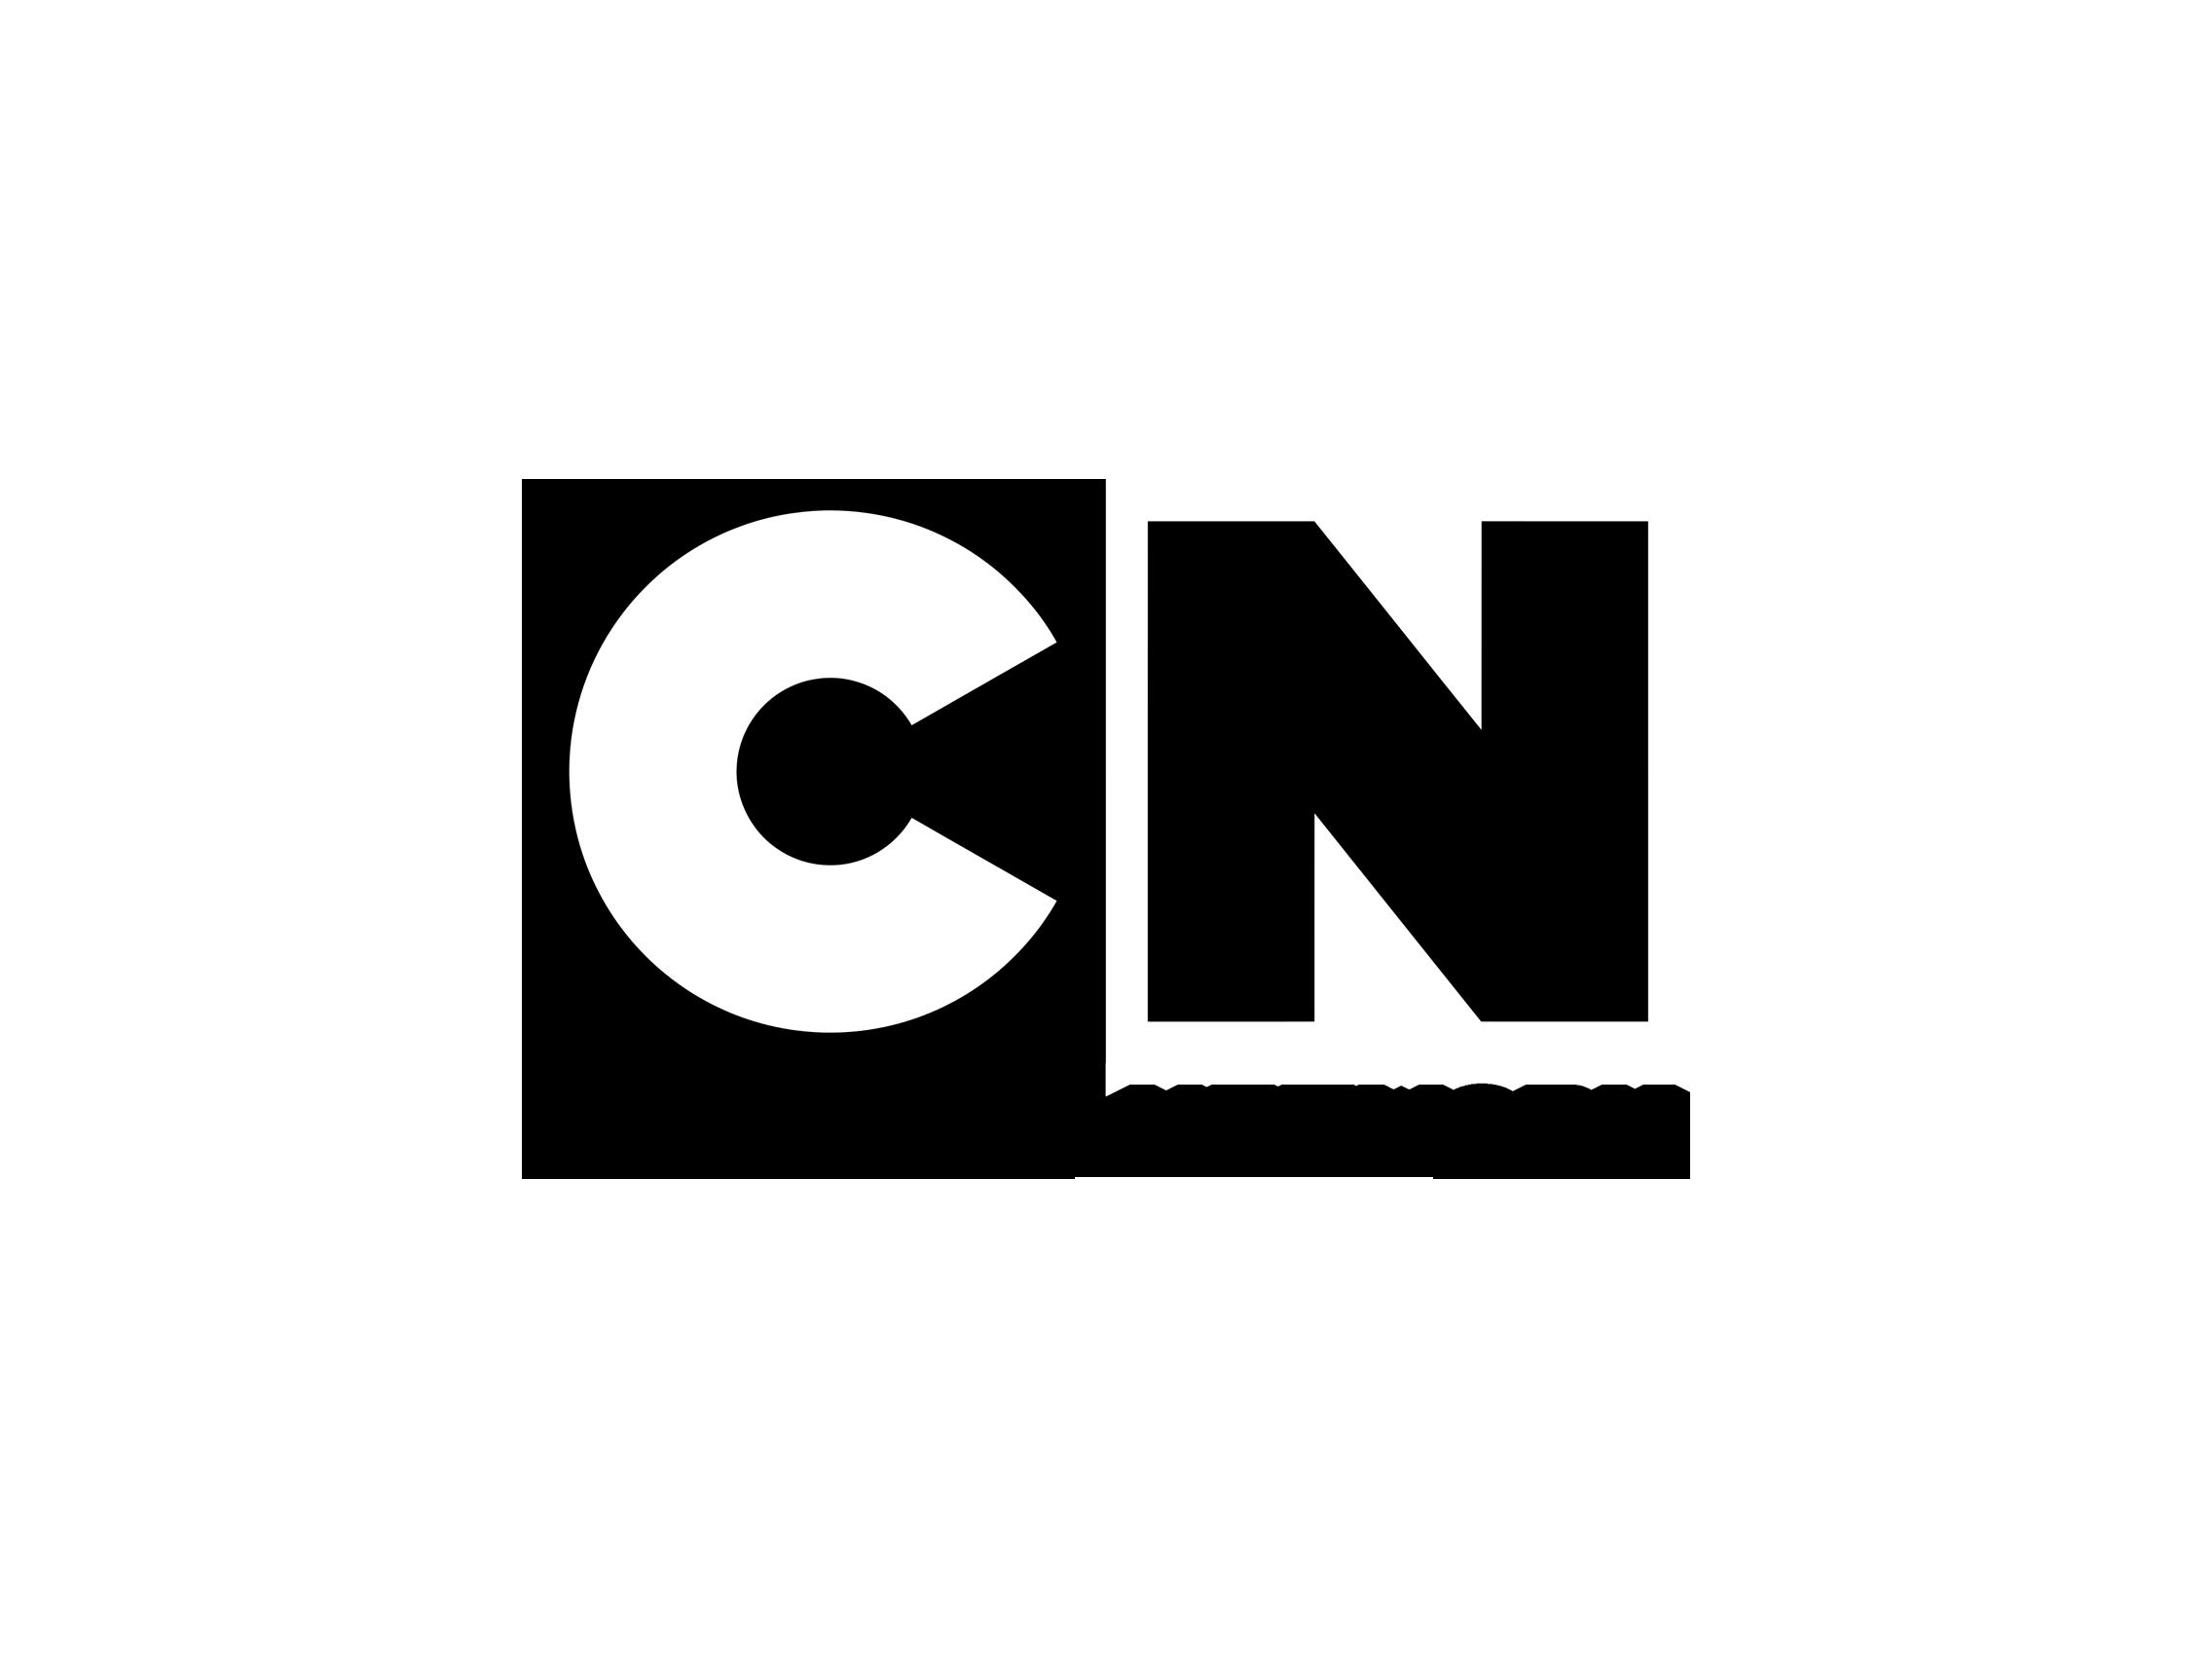 Cartoon-Network-logo-2010